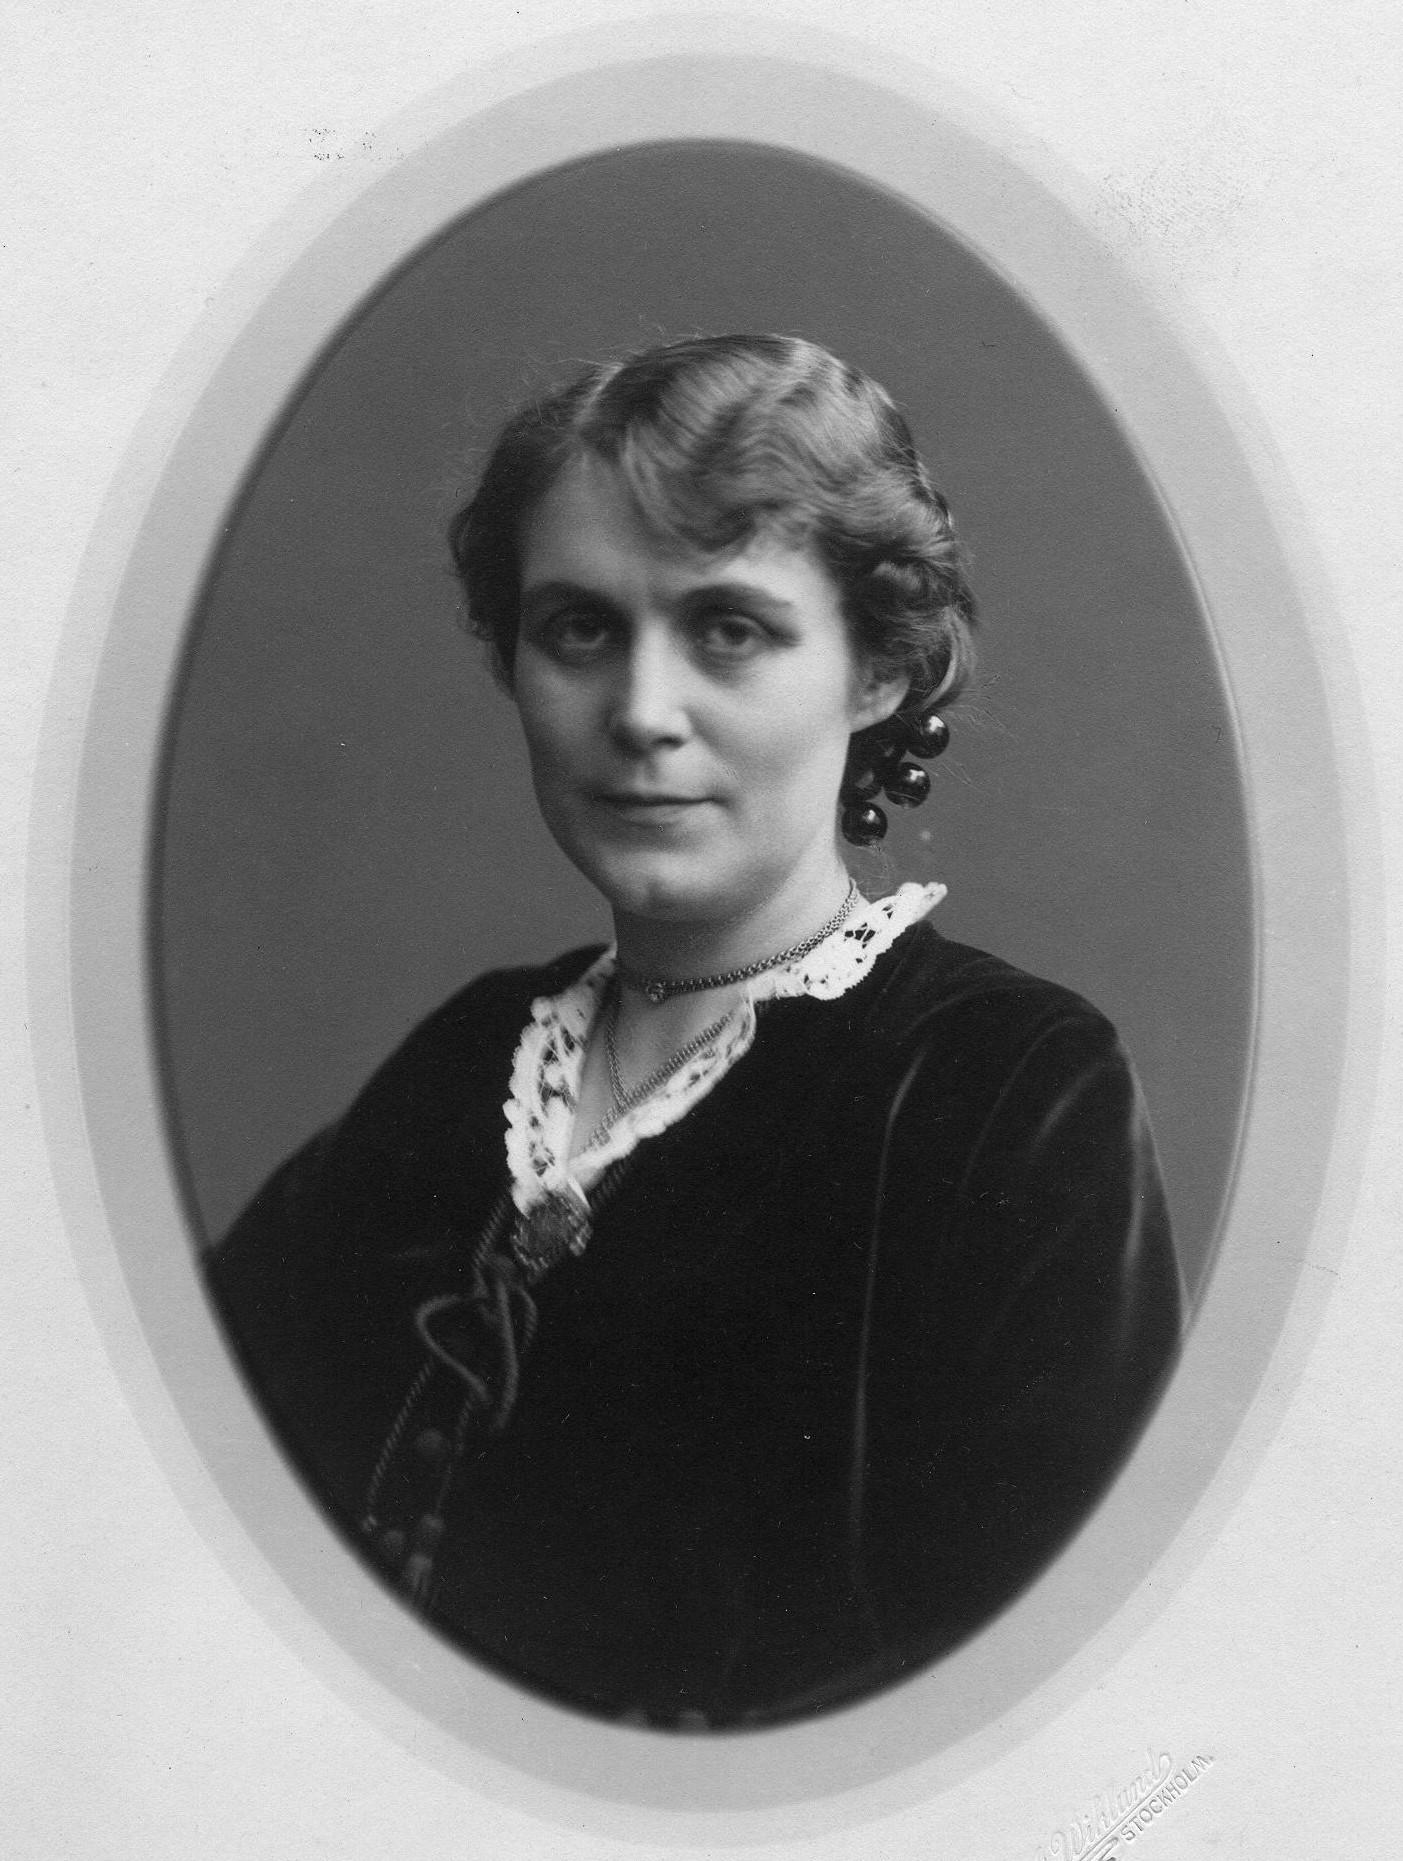 Karin Fjällbäck-Holmgren, 1915. Foto: A. Wiklund, Stockholm (KvinnSam, Göteborg universitetsbibliotek)